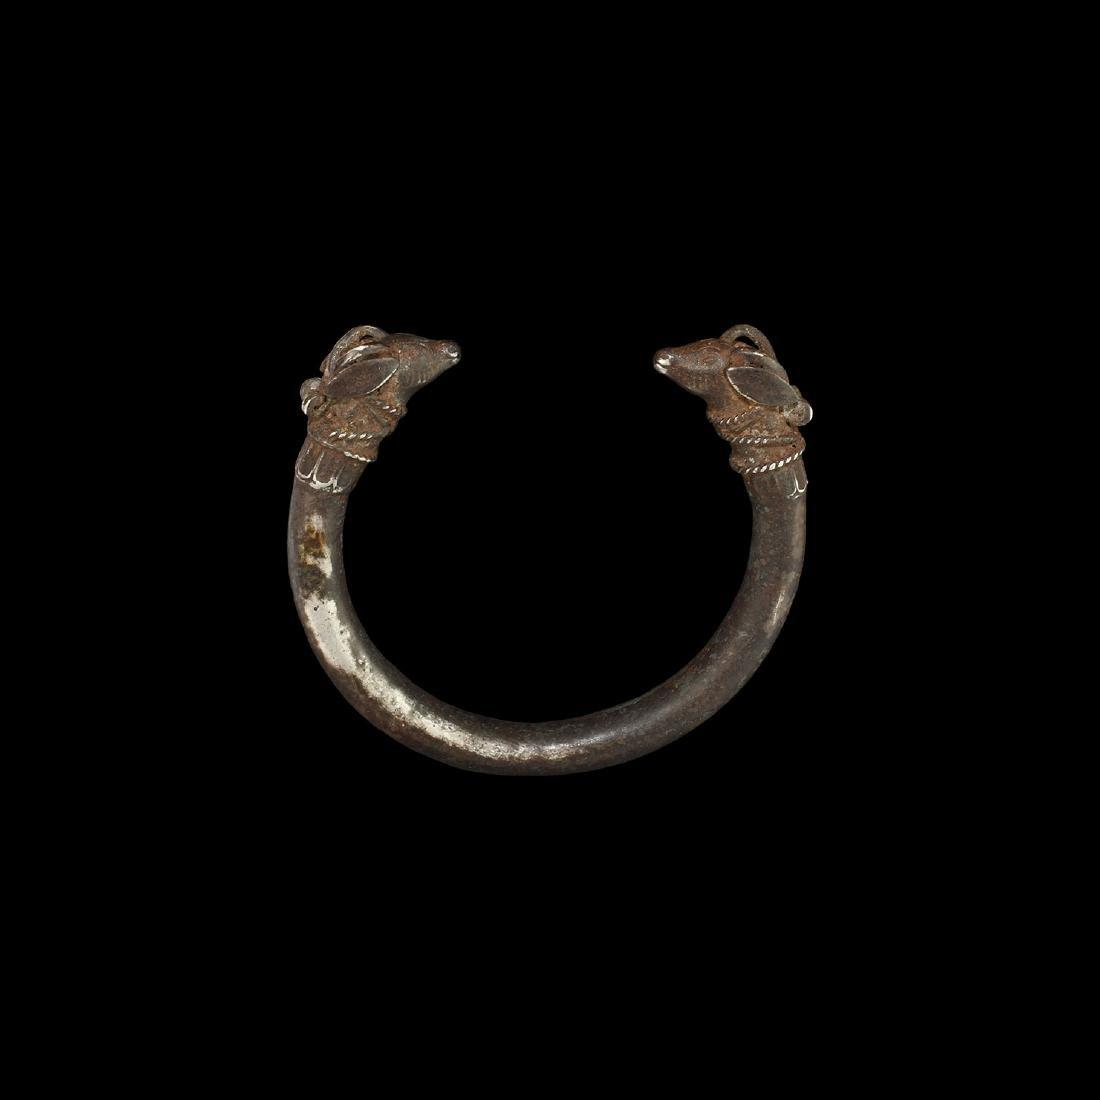 Phoenician Silver Bracelet with Antelope Heads